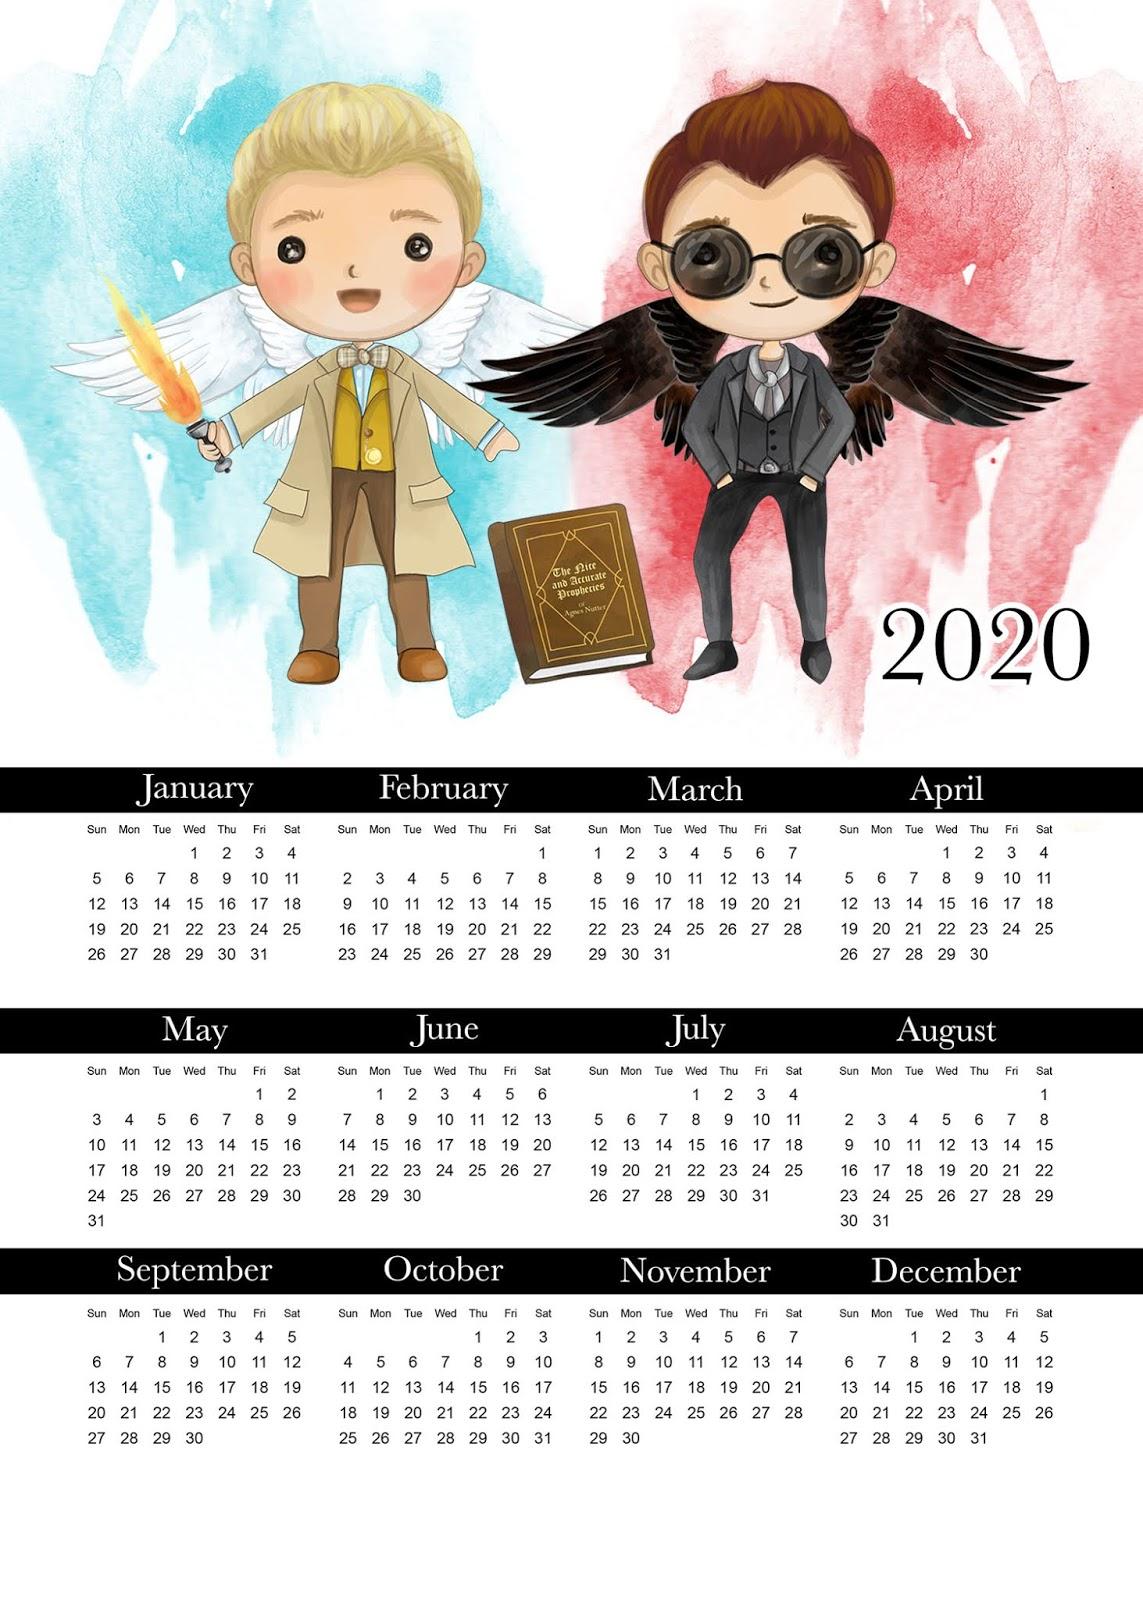 Good Omens Free Printable 2020 Calendar Oh My Fiesta For Geeks